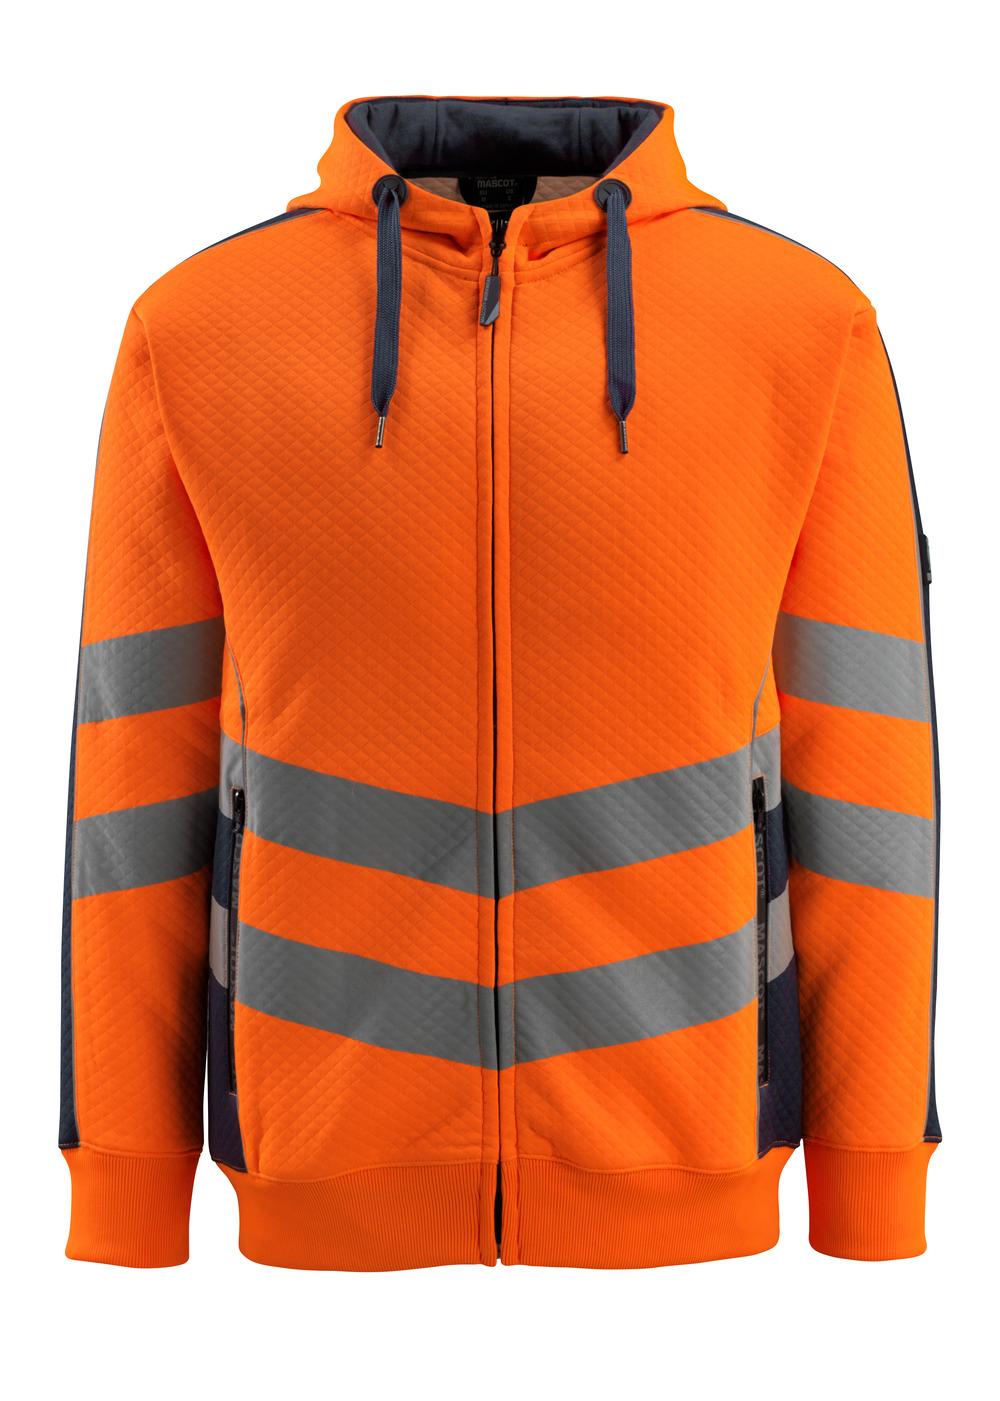 50138-932-14010 Kapuzenpullover - hi-vis Orange/Schwarzblau